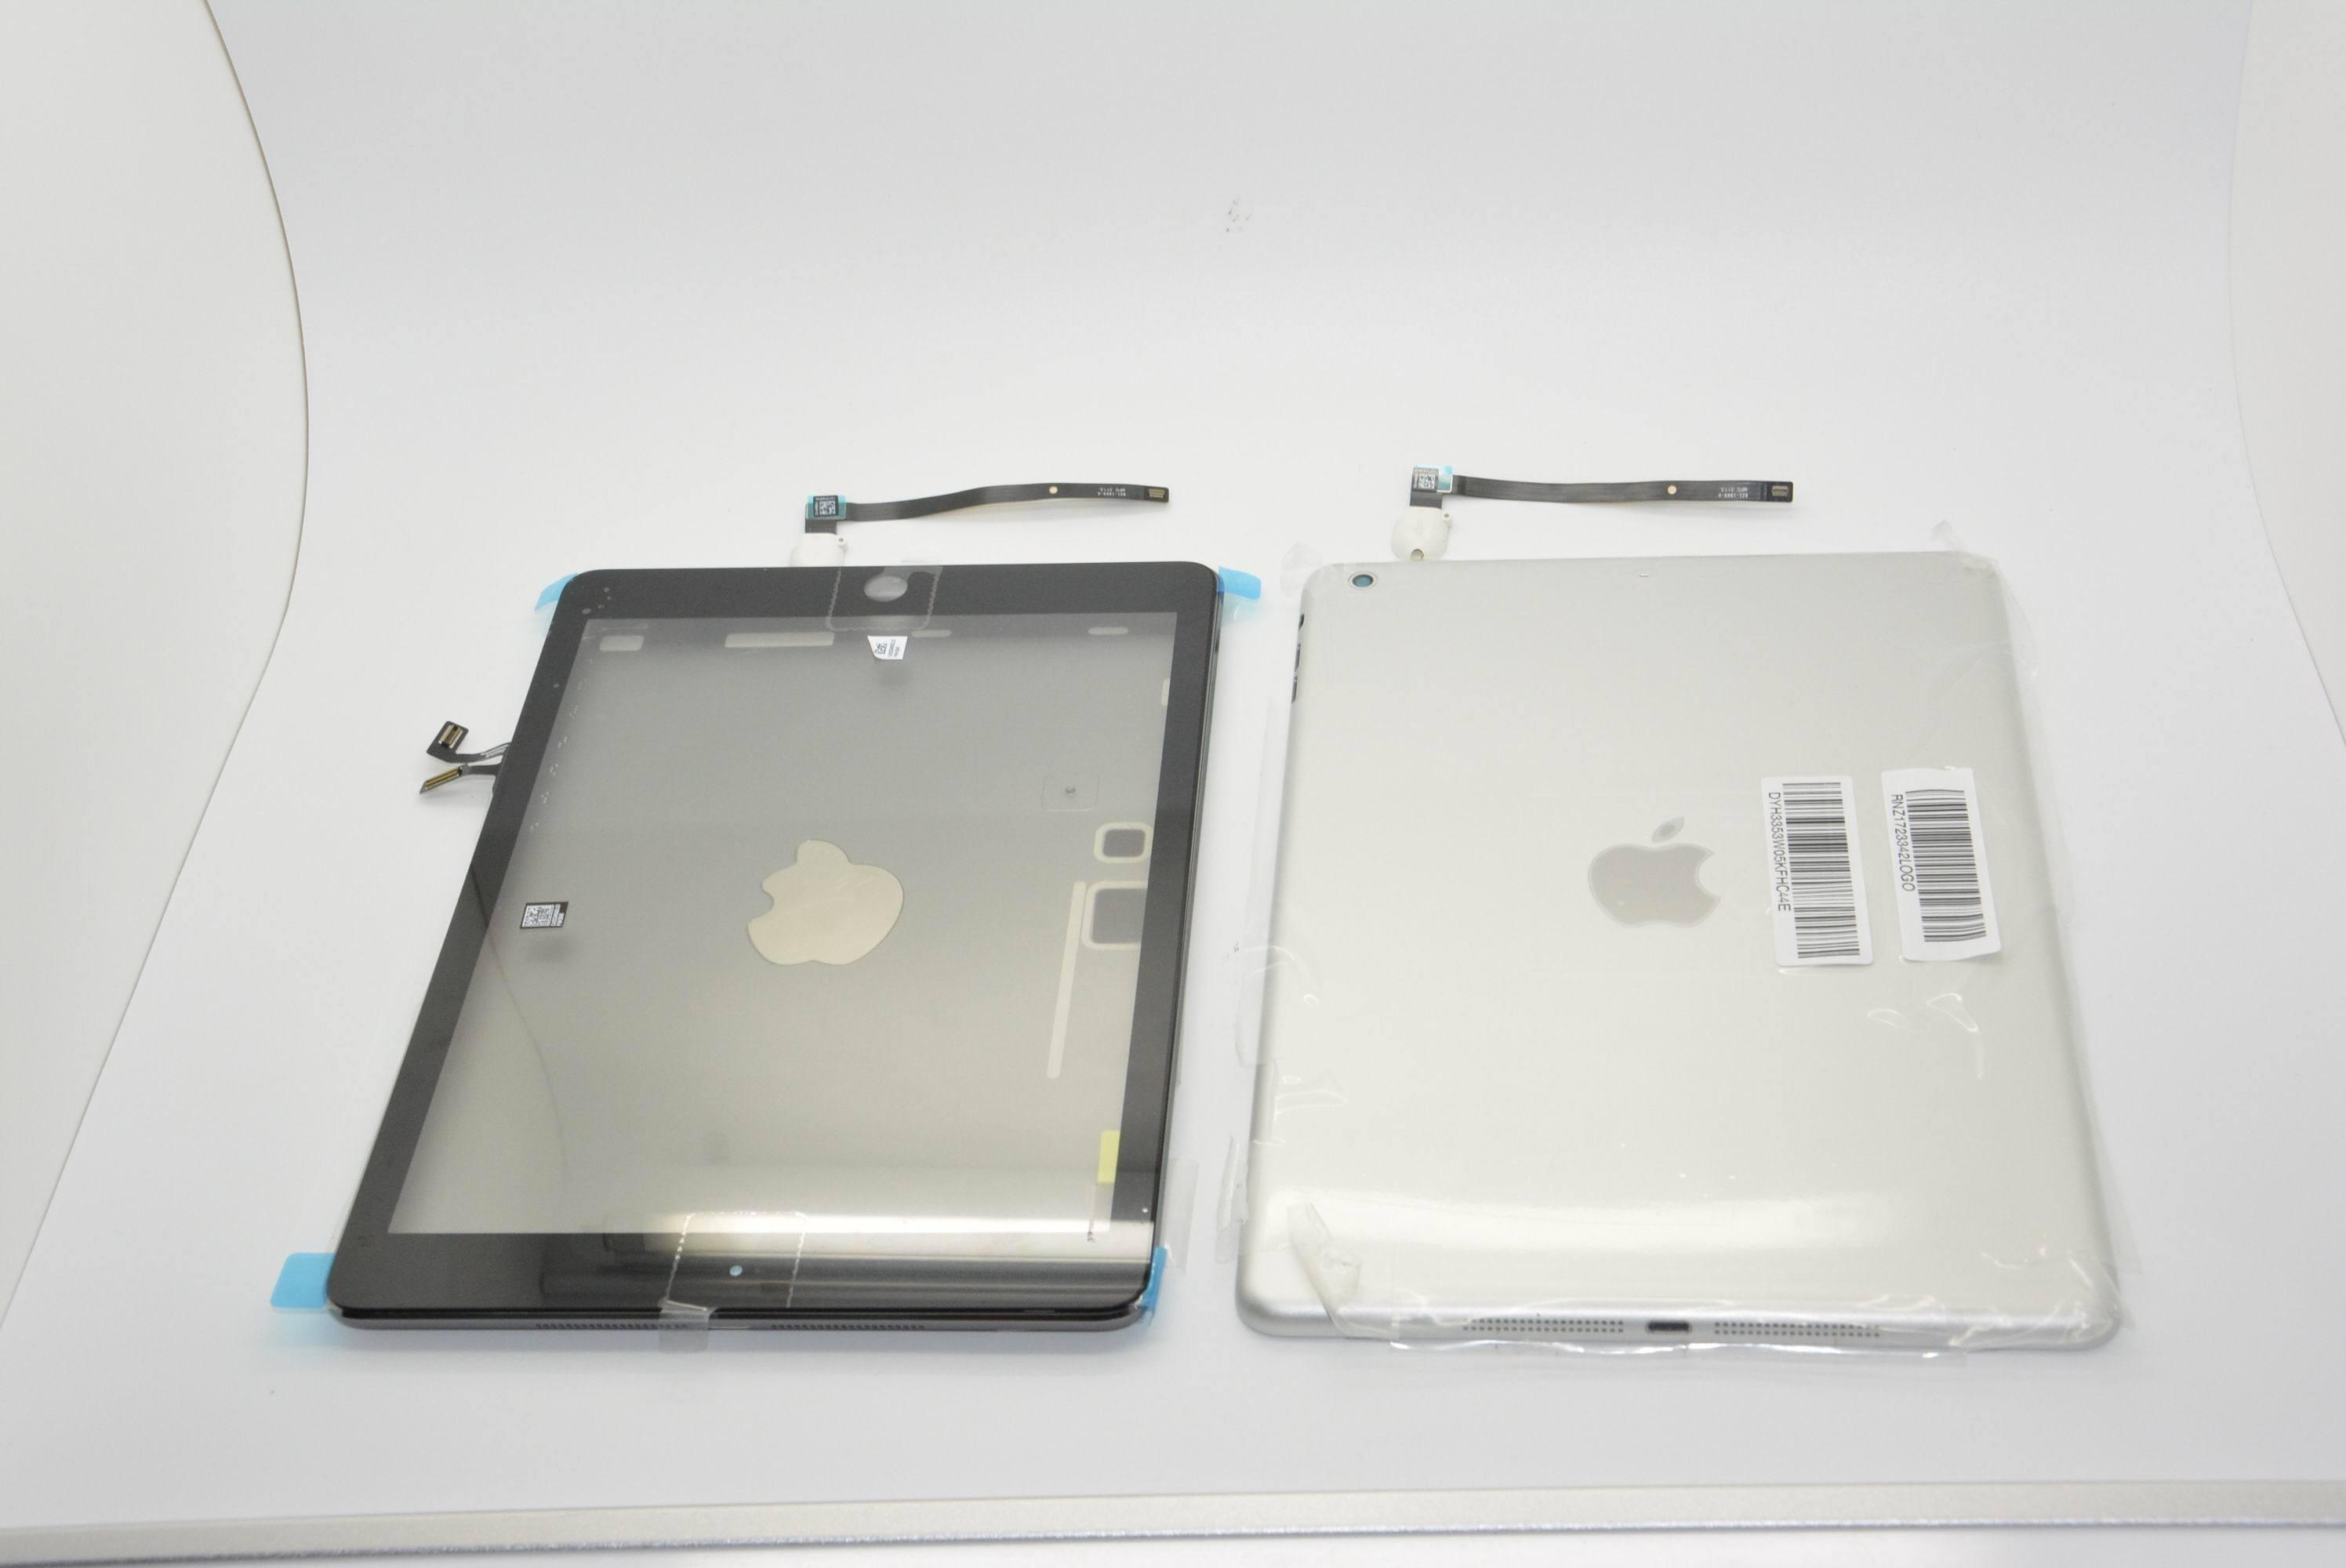 ipad 5 gris sideral argent - iPad 5 gris sidéral & argent : photos des coques